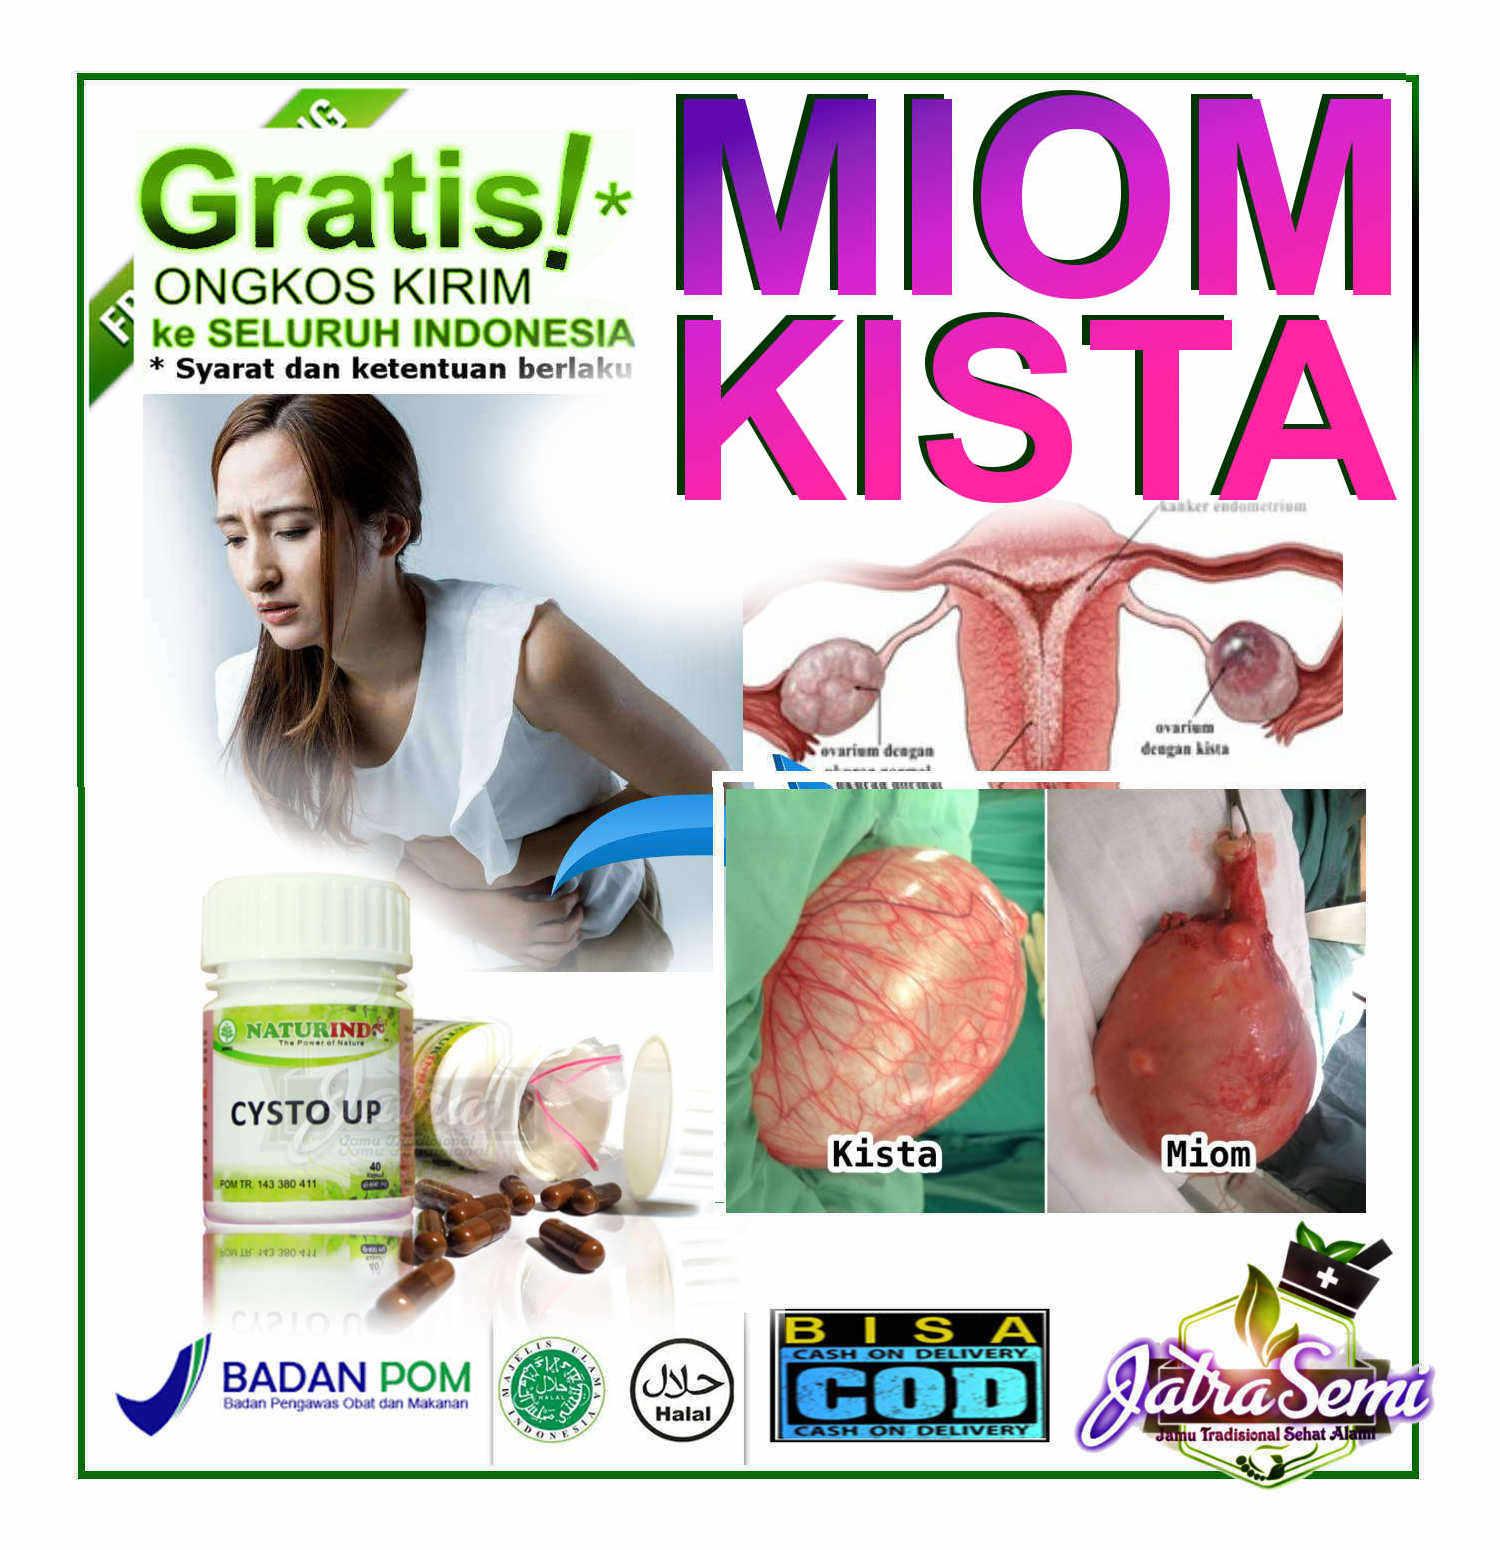 obat herbal cysto up naturindo (spesial myom & kista)